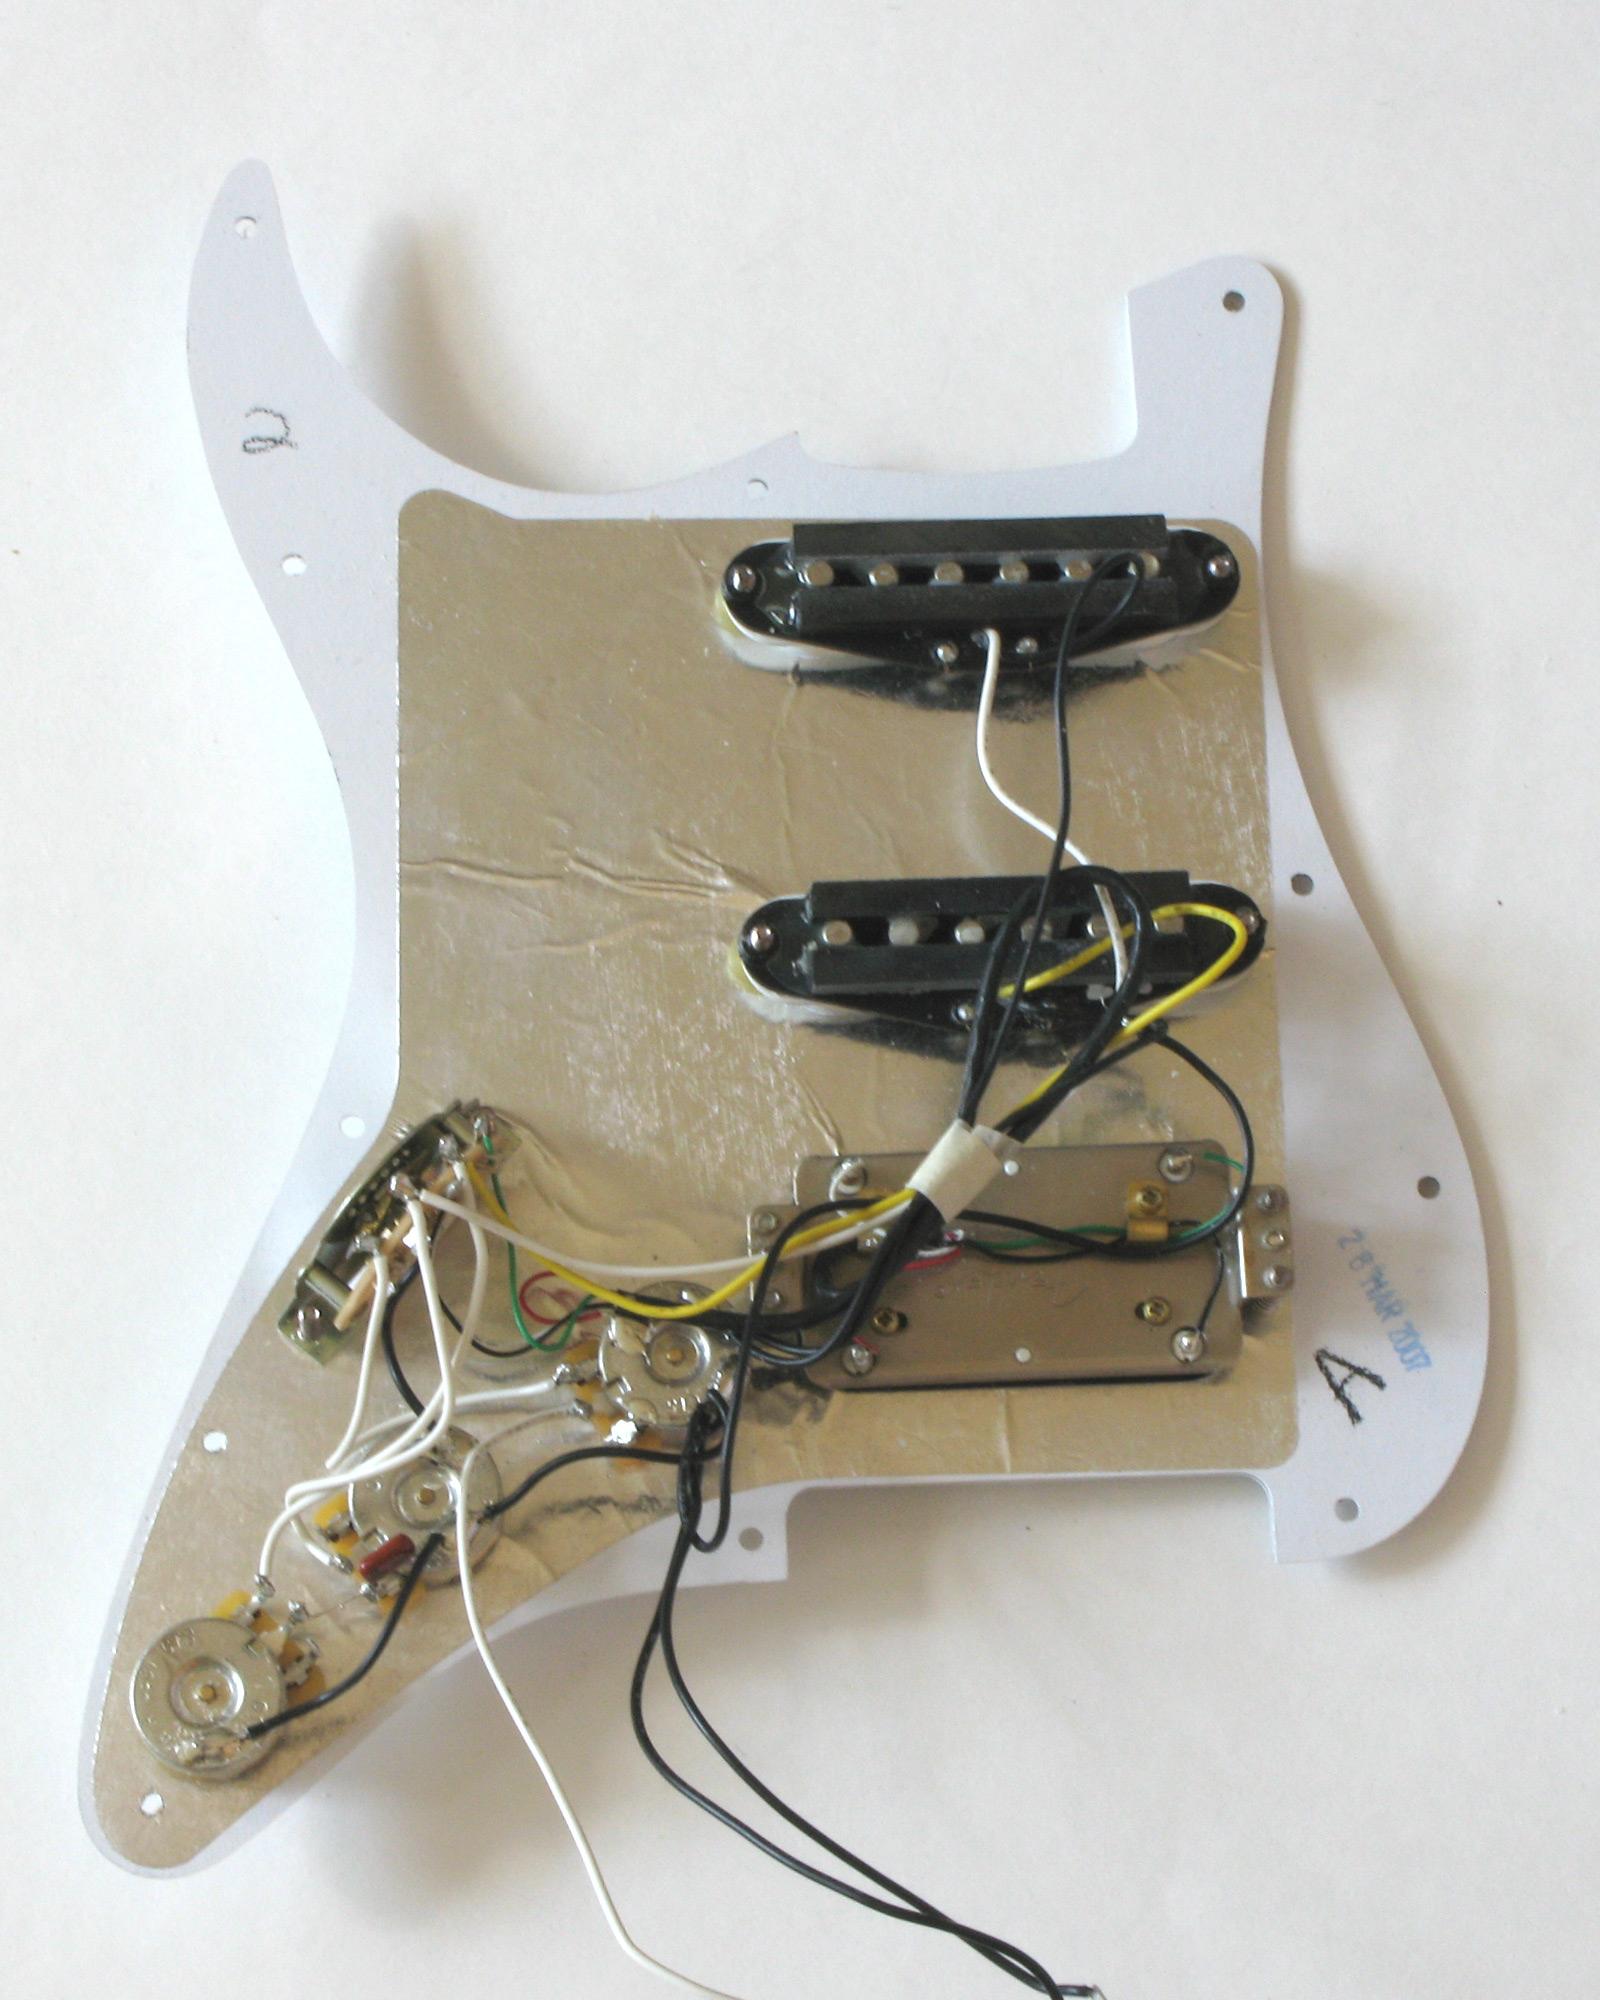 Fender Stratocaster Mexican Hss Pickguard Wiring Diagram - Fender Hss Wiring Diagram